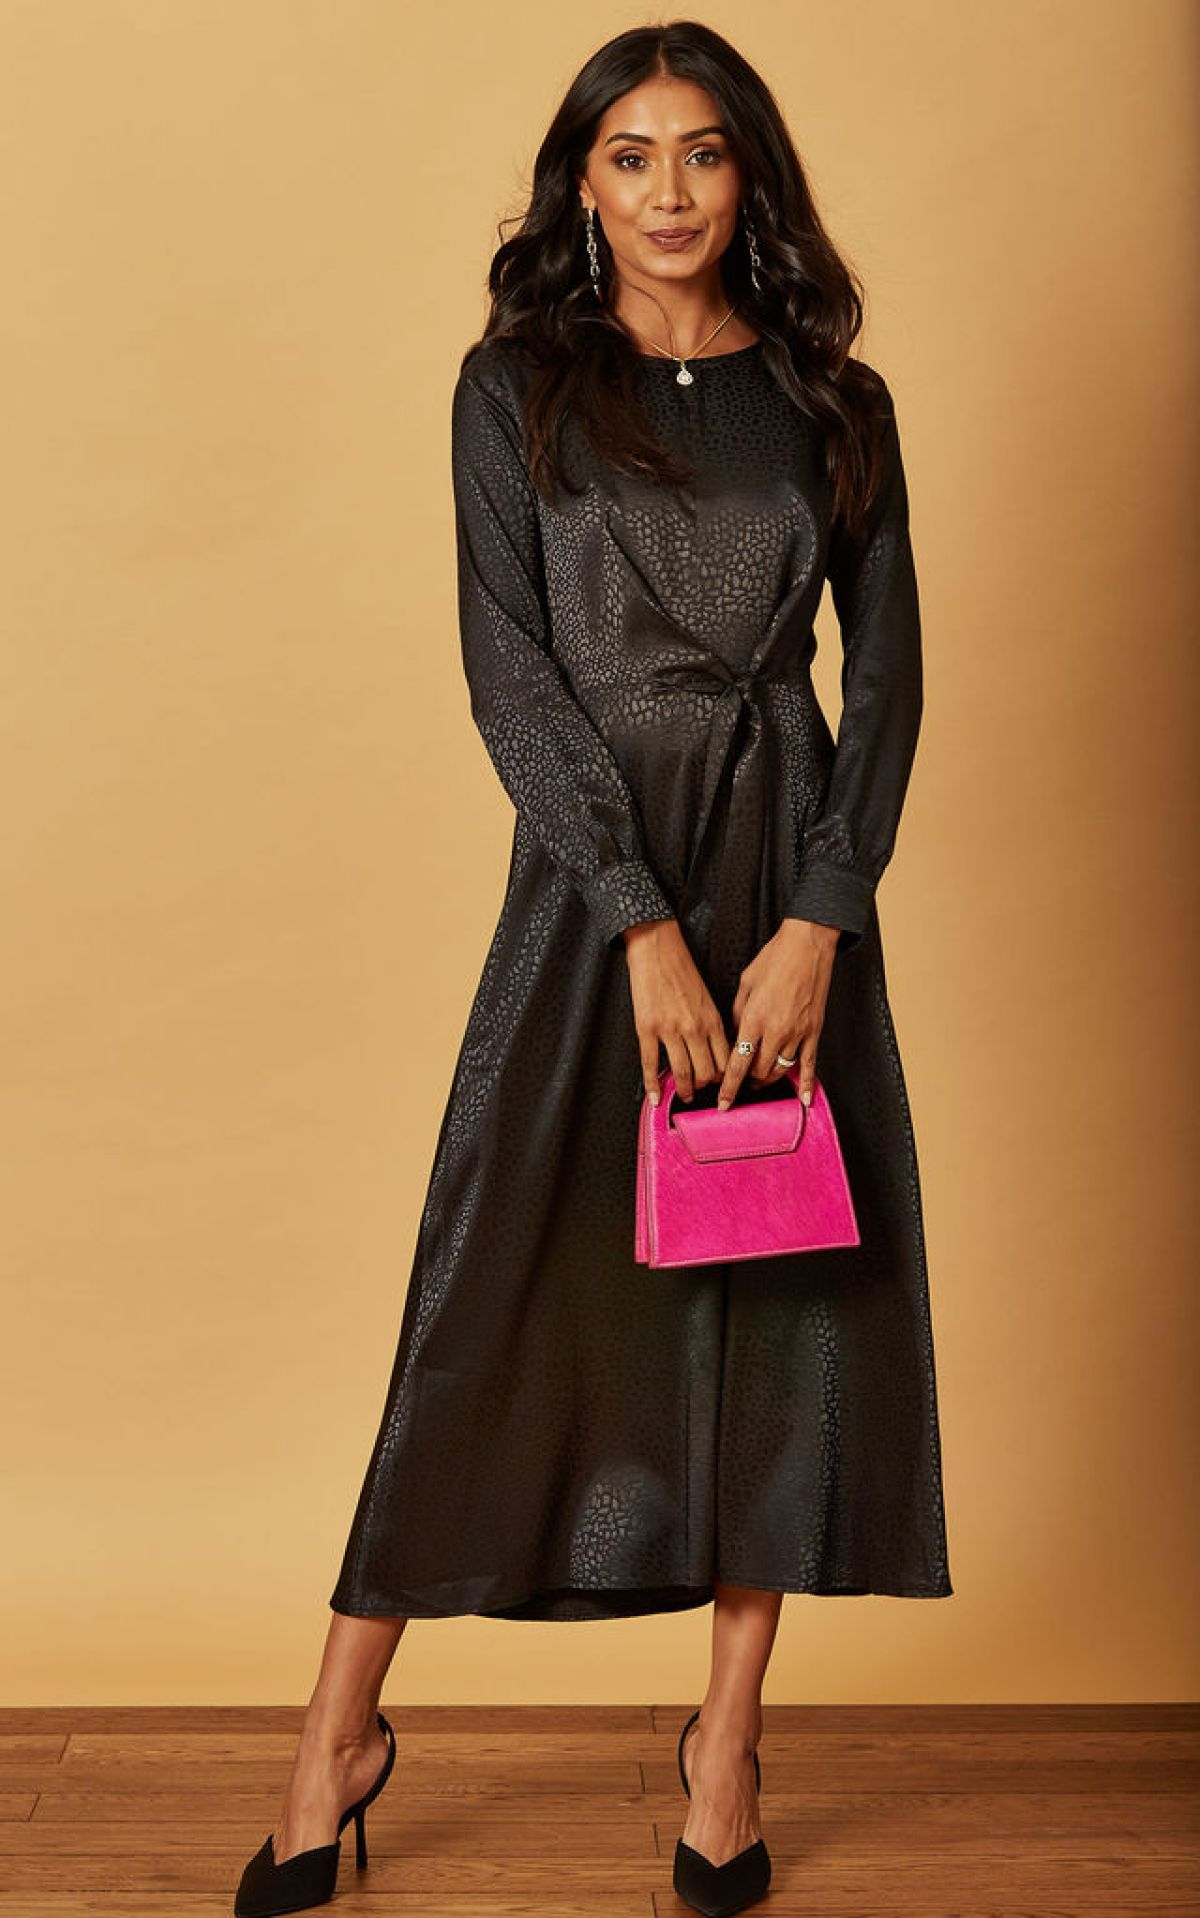 satin-jacquard-tie-front-midi-dress-in-black-summer-sale